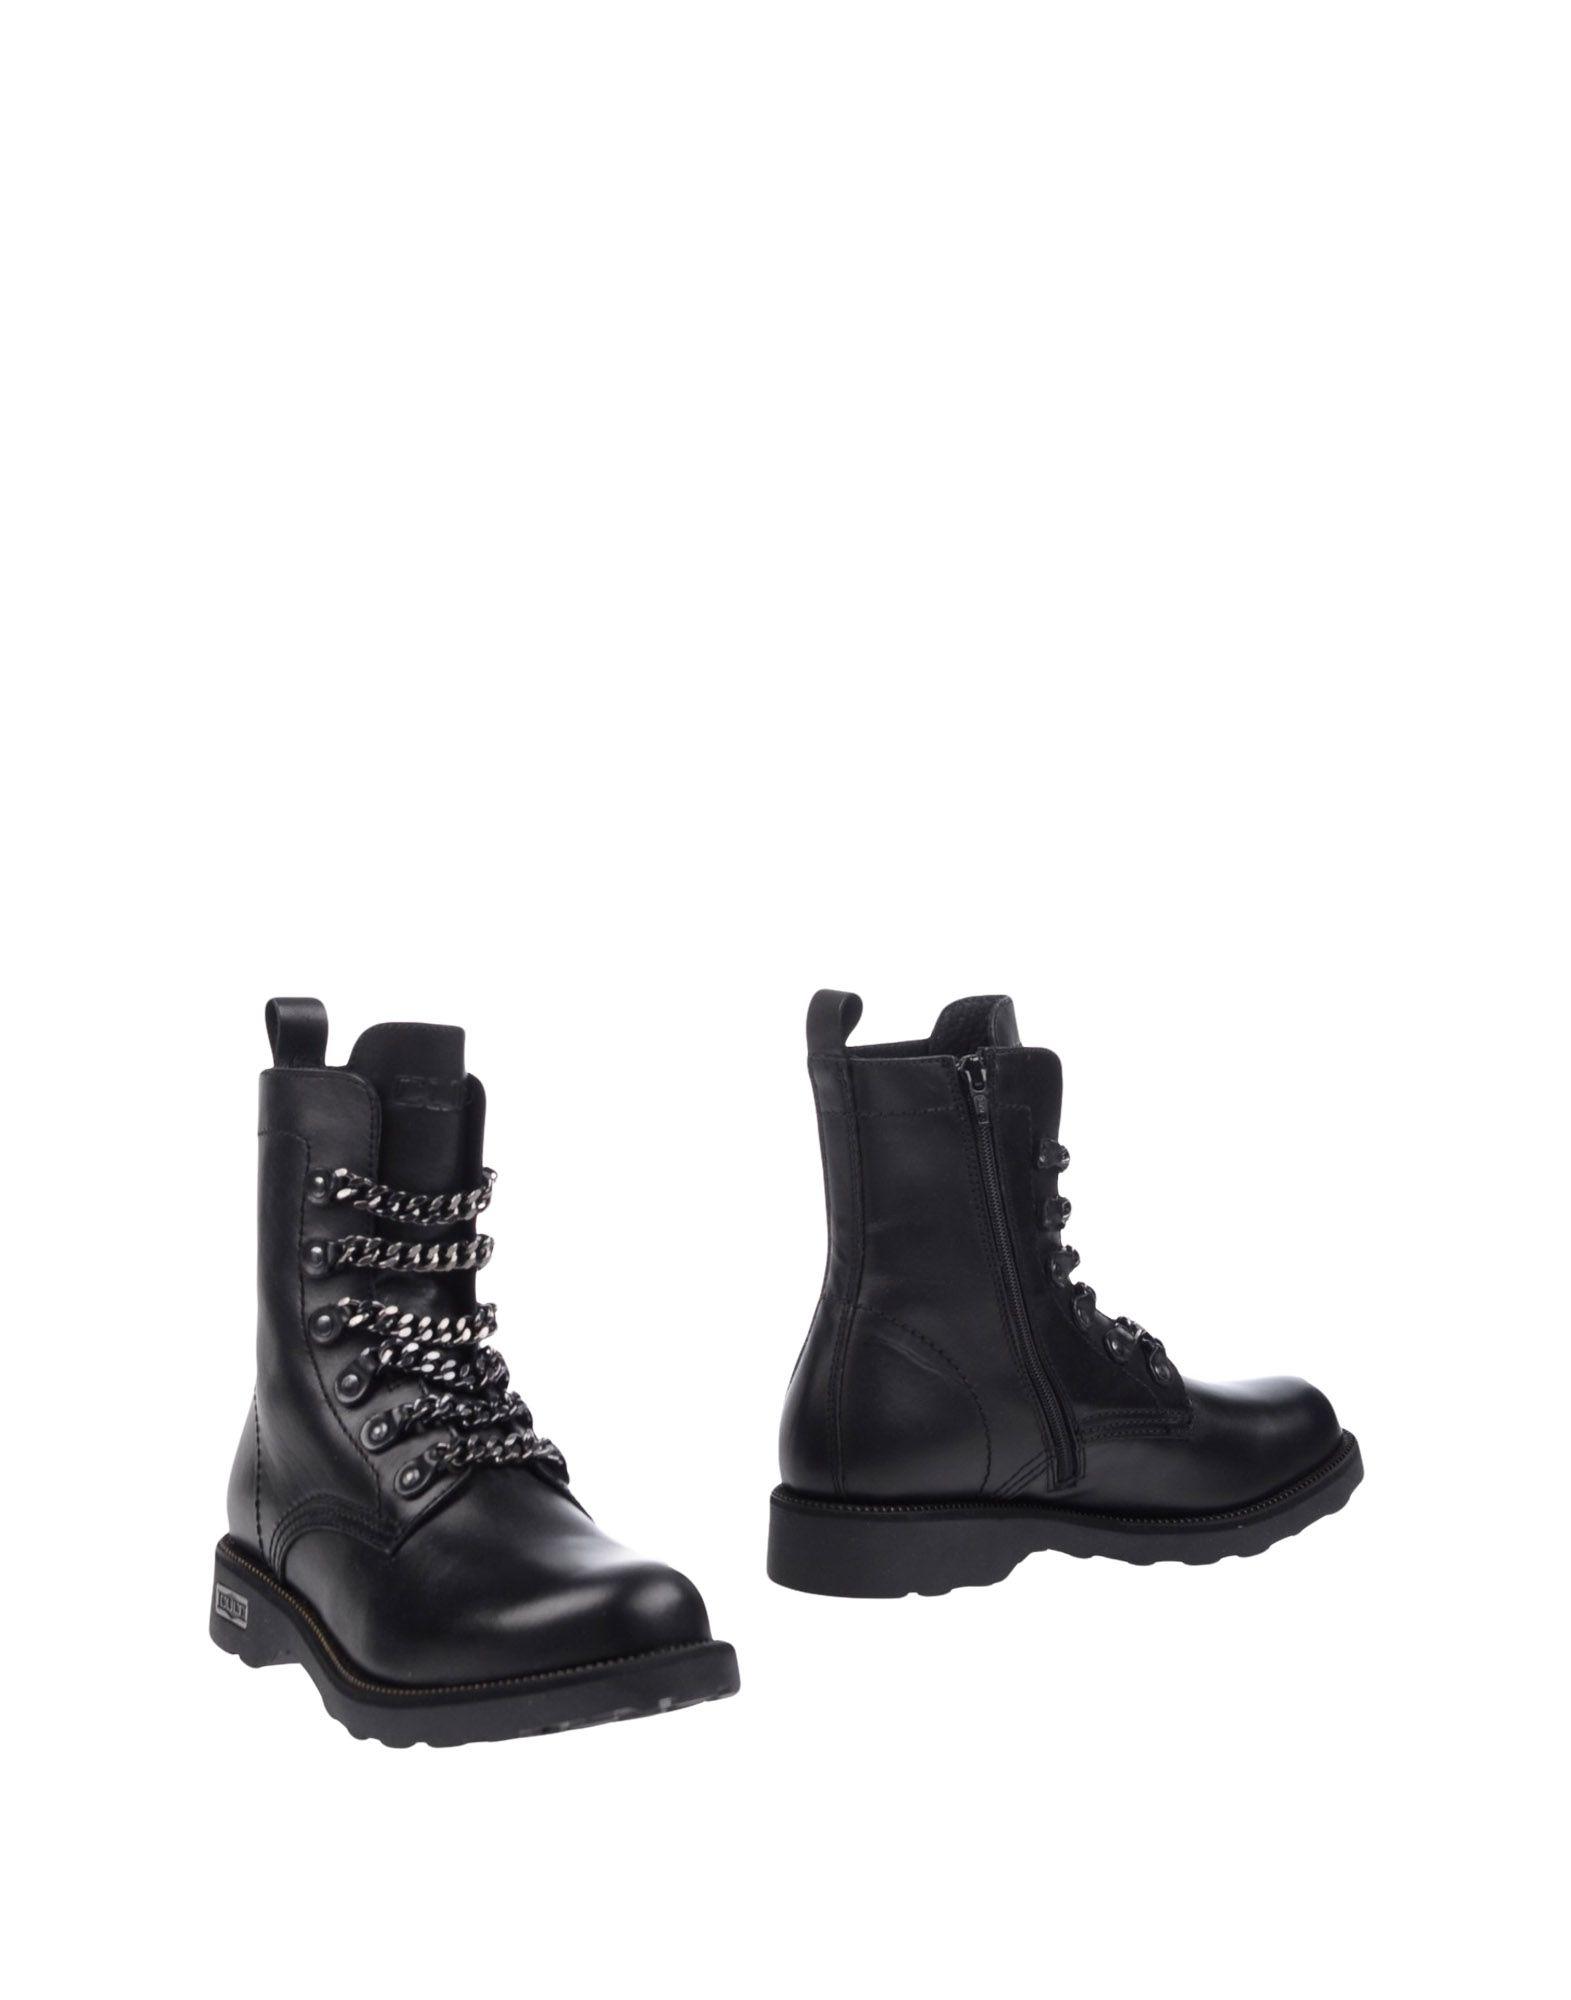 Cult Stiefelette Damen  11299326MA Gute Qualität beliebte Schuhe